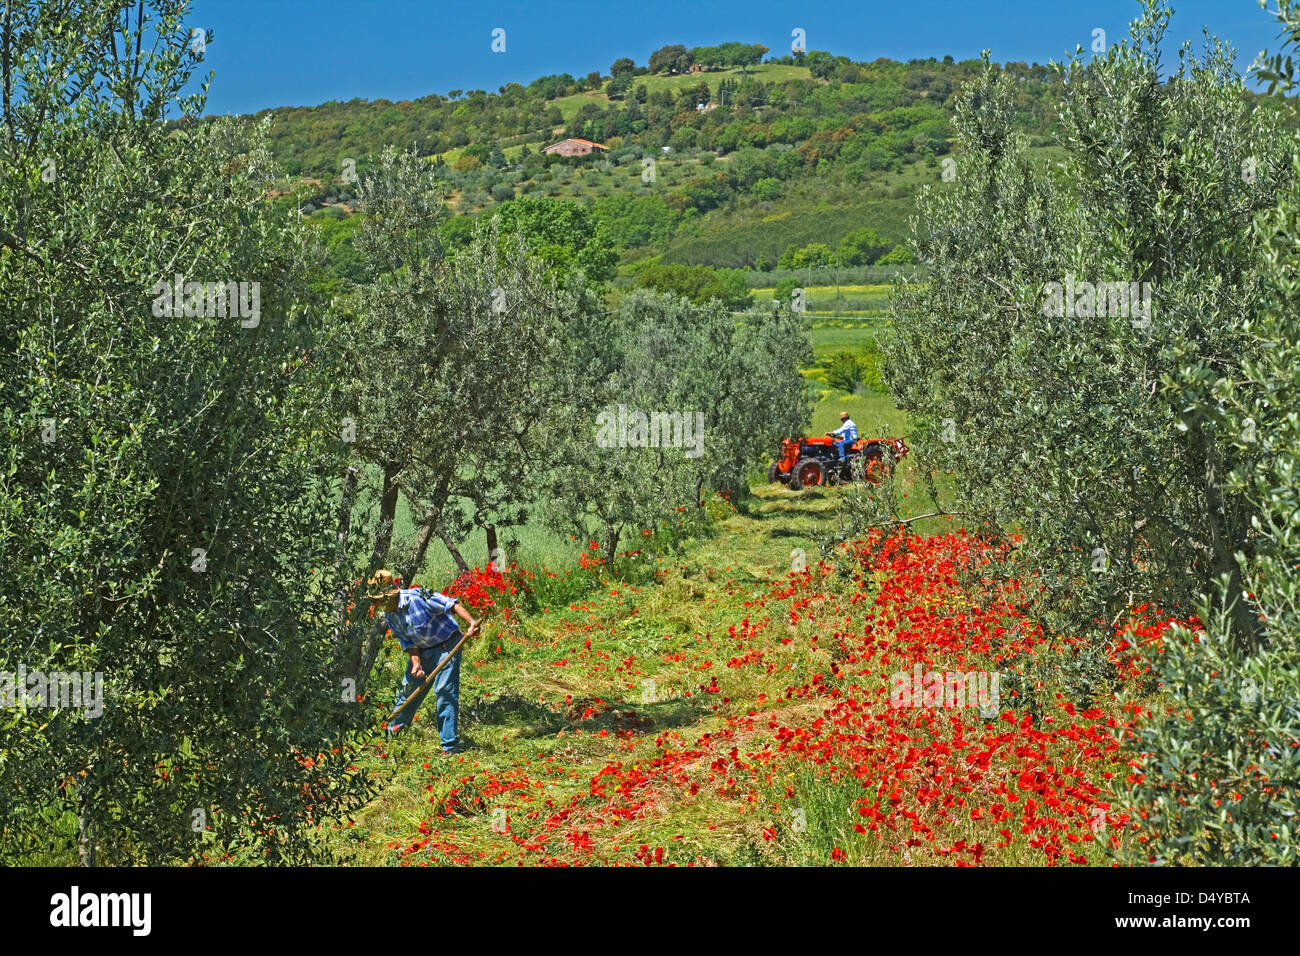 Tuscany - Farmers cutting back poppies under Olive trees near San Giminiano - Stock Image